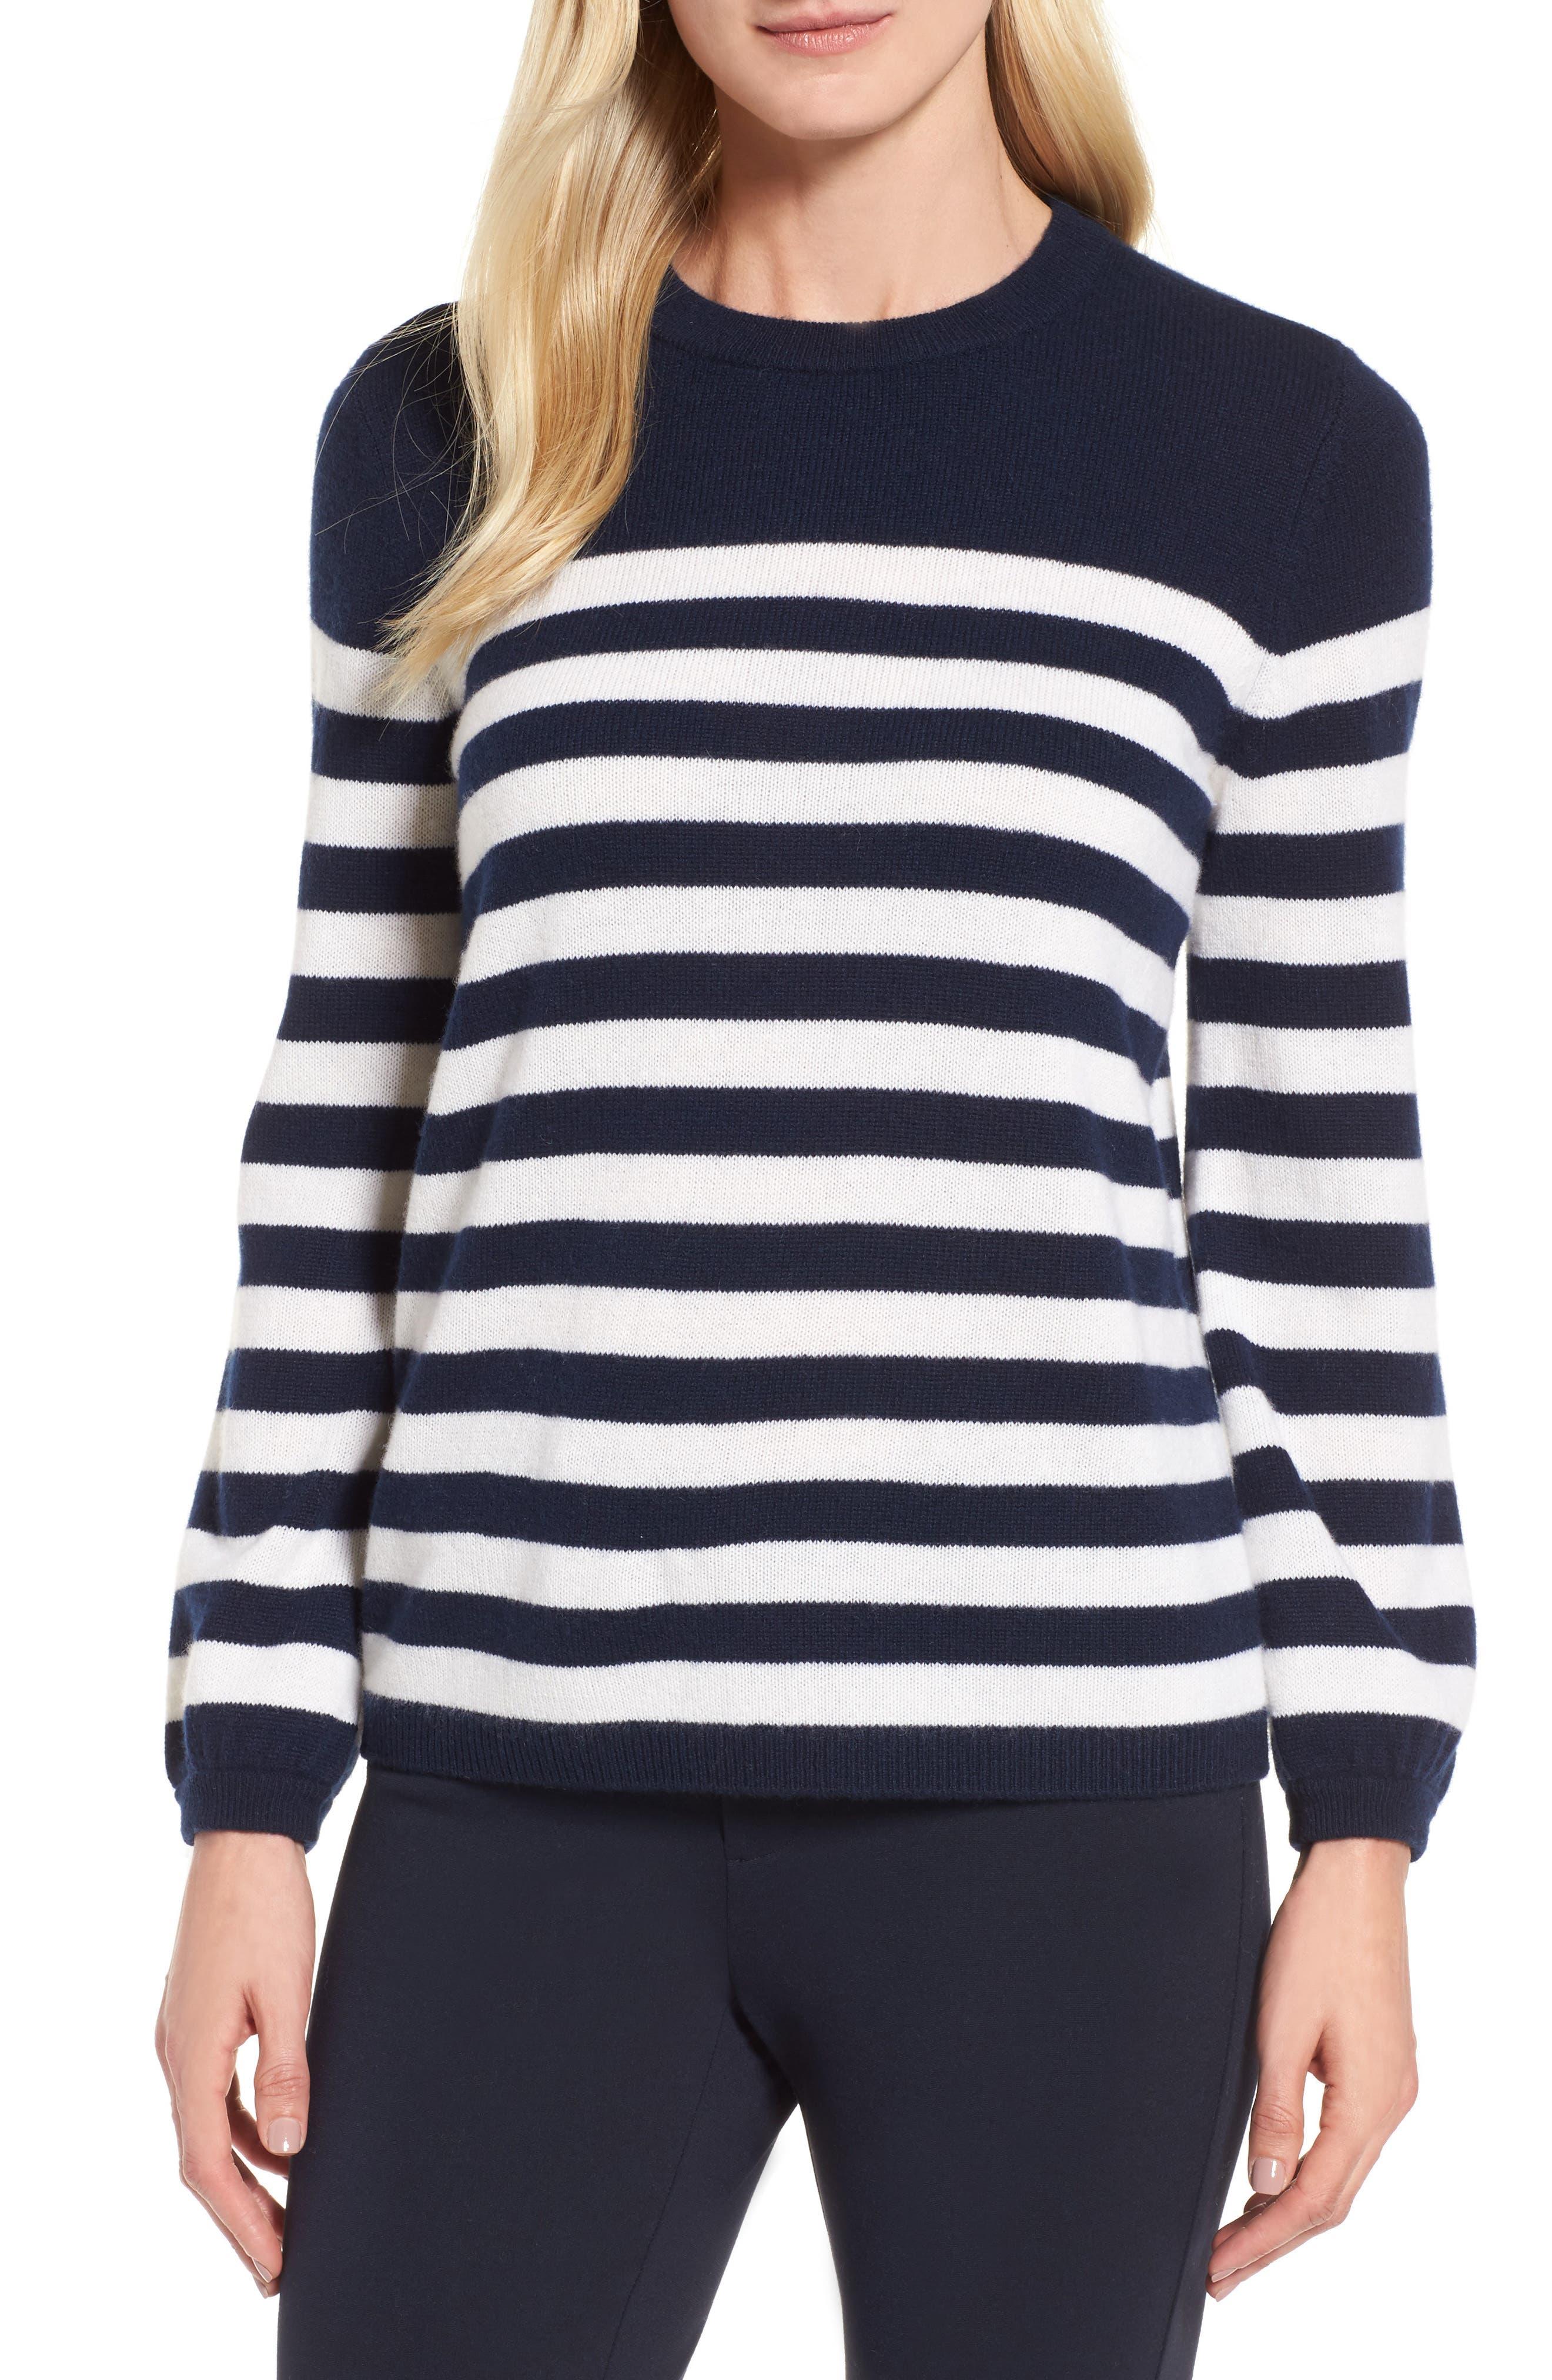 Alternate Image 1 Selected - Nordstrom Signature Stripe Cashmere Sweater